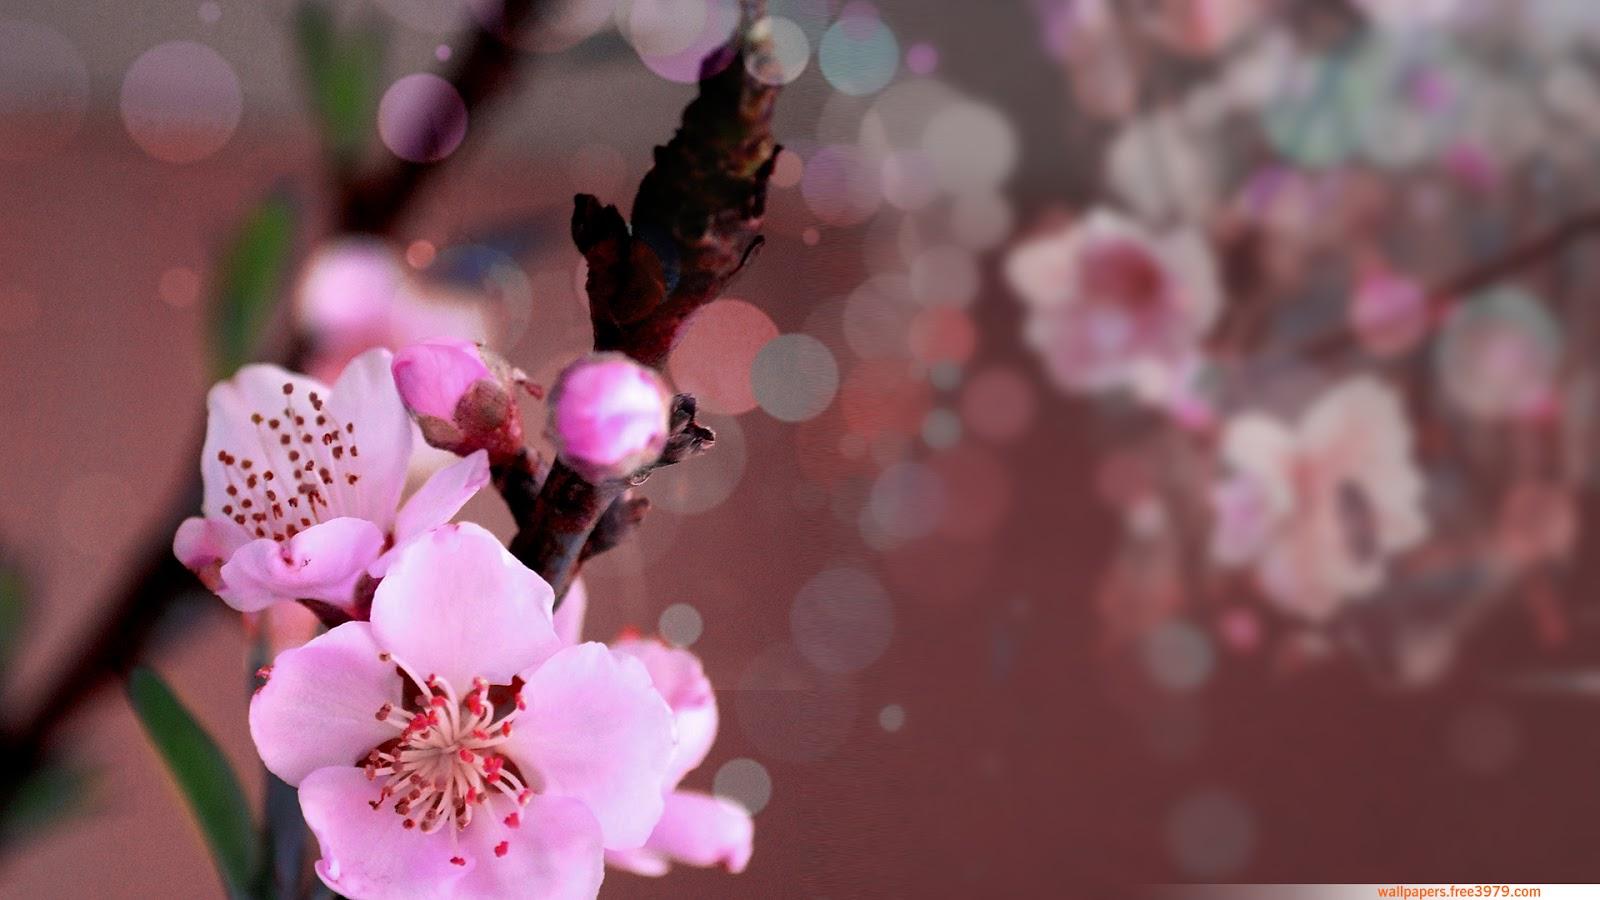 peach blossoms wallpaper - photo #14